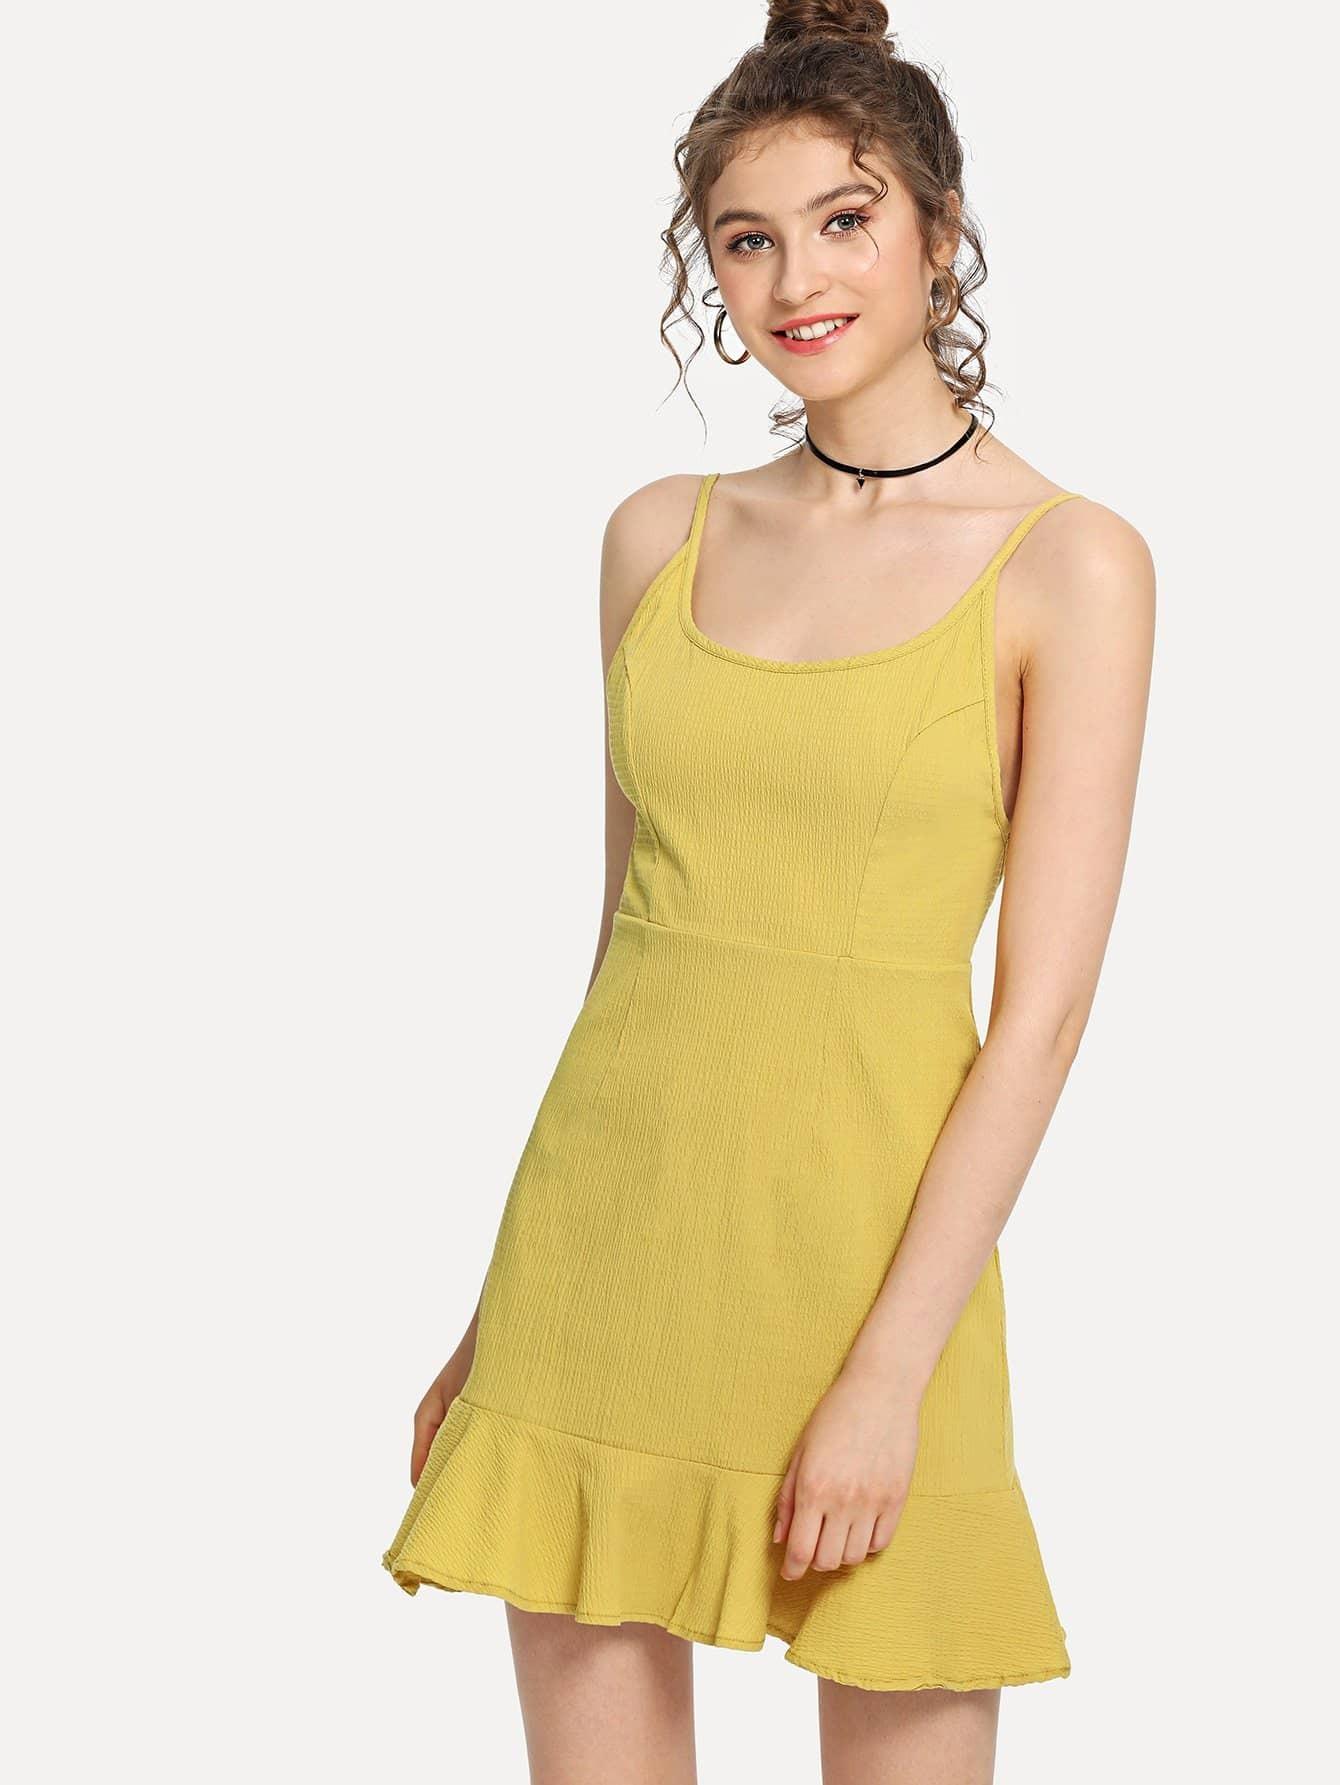 36f559a8904 Solid Ruffle Hem Backless Cami Dress EmmaCloth-Women Fast ...